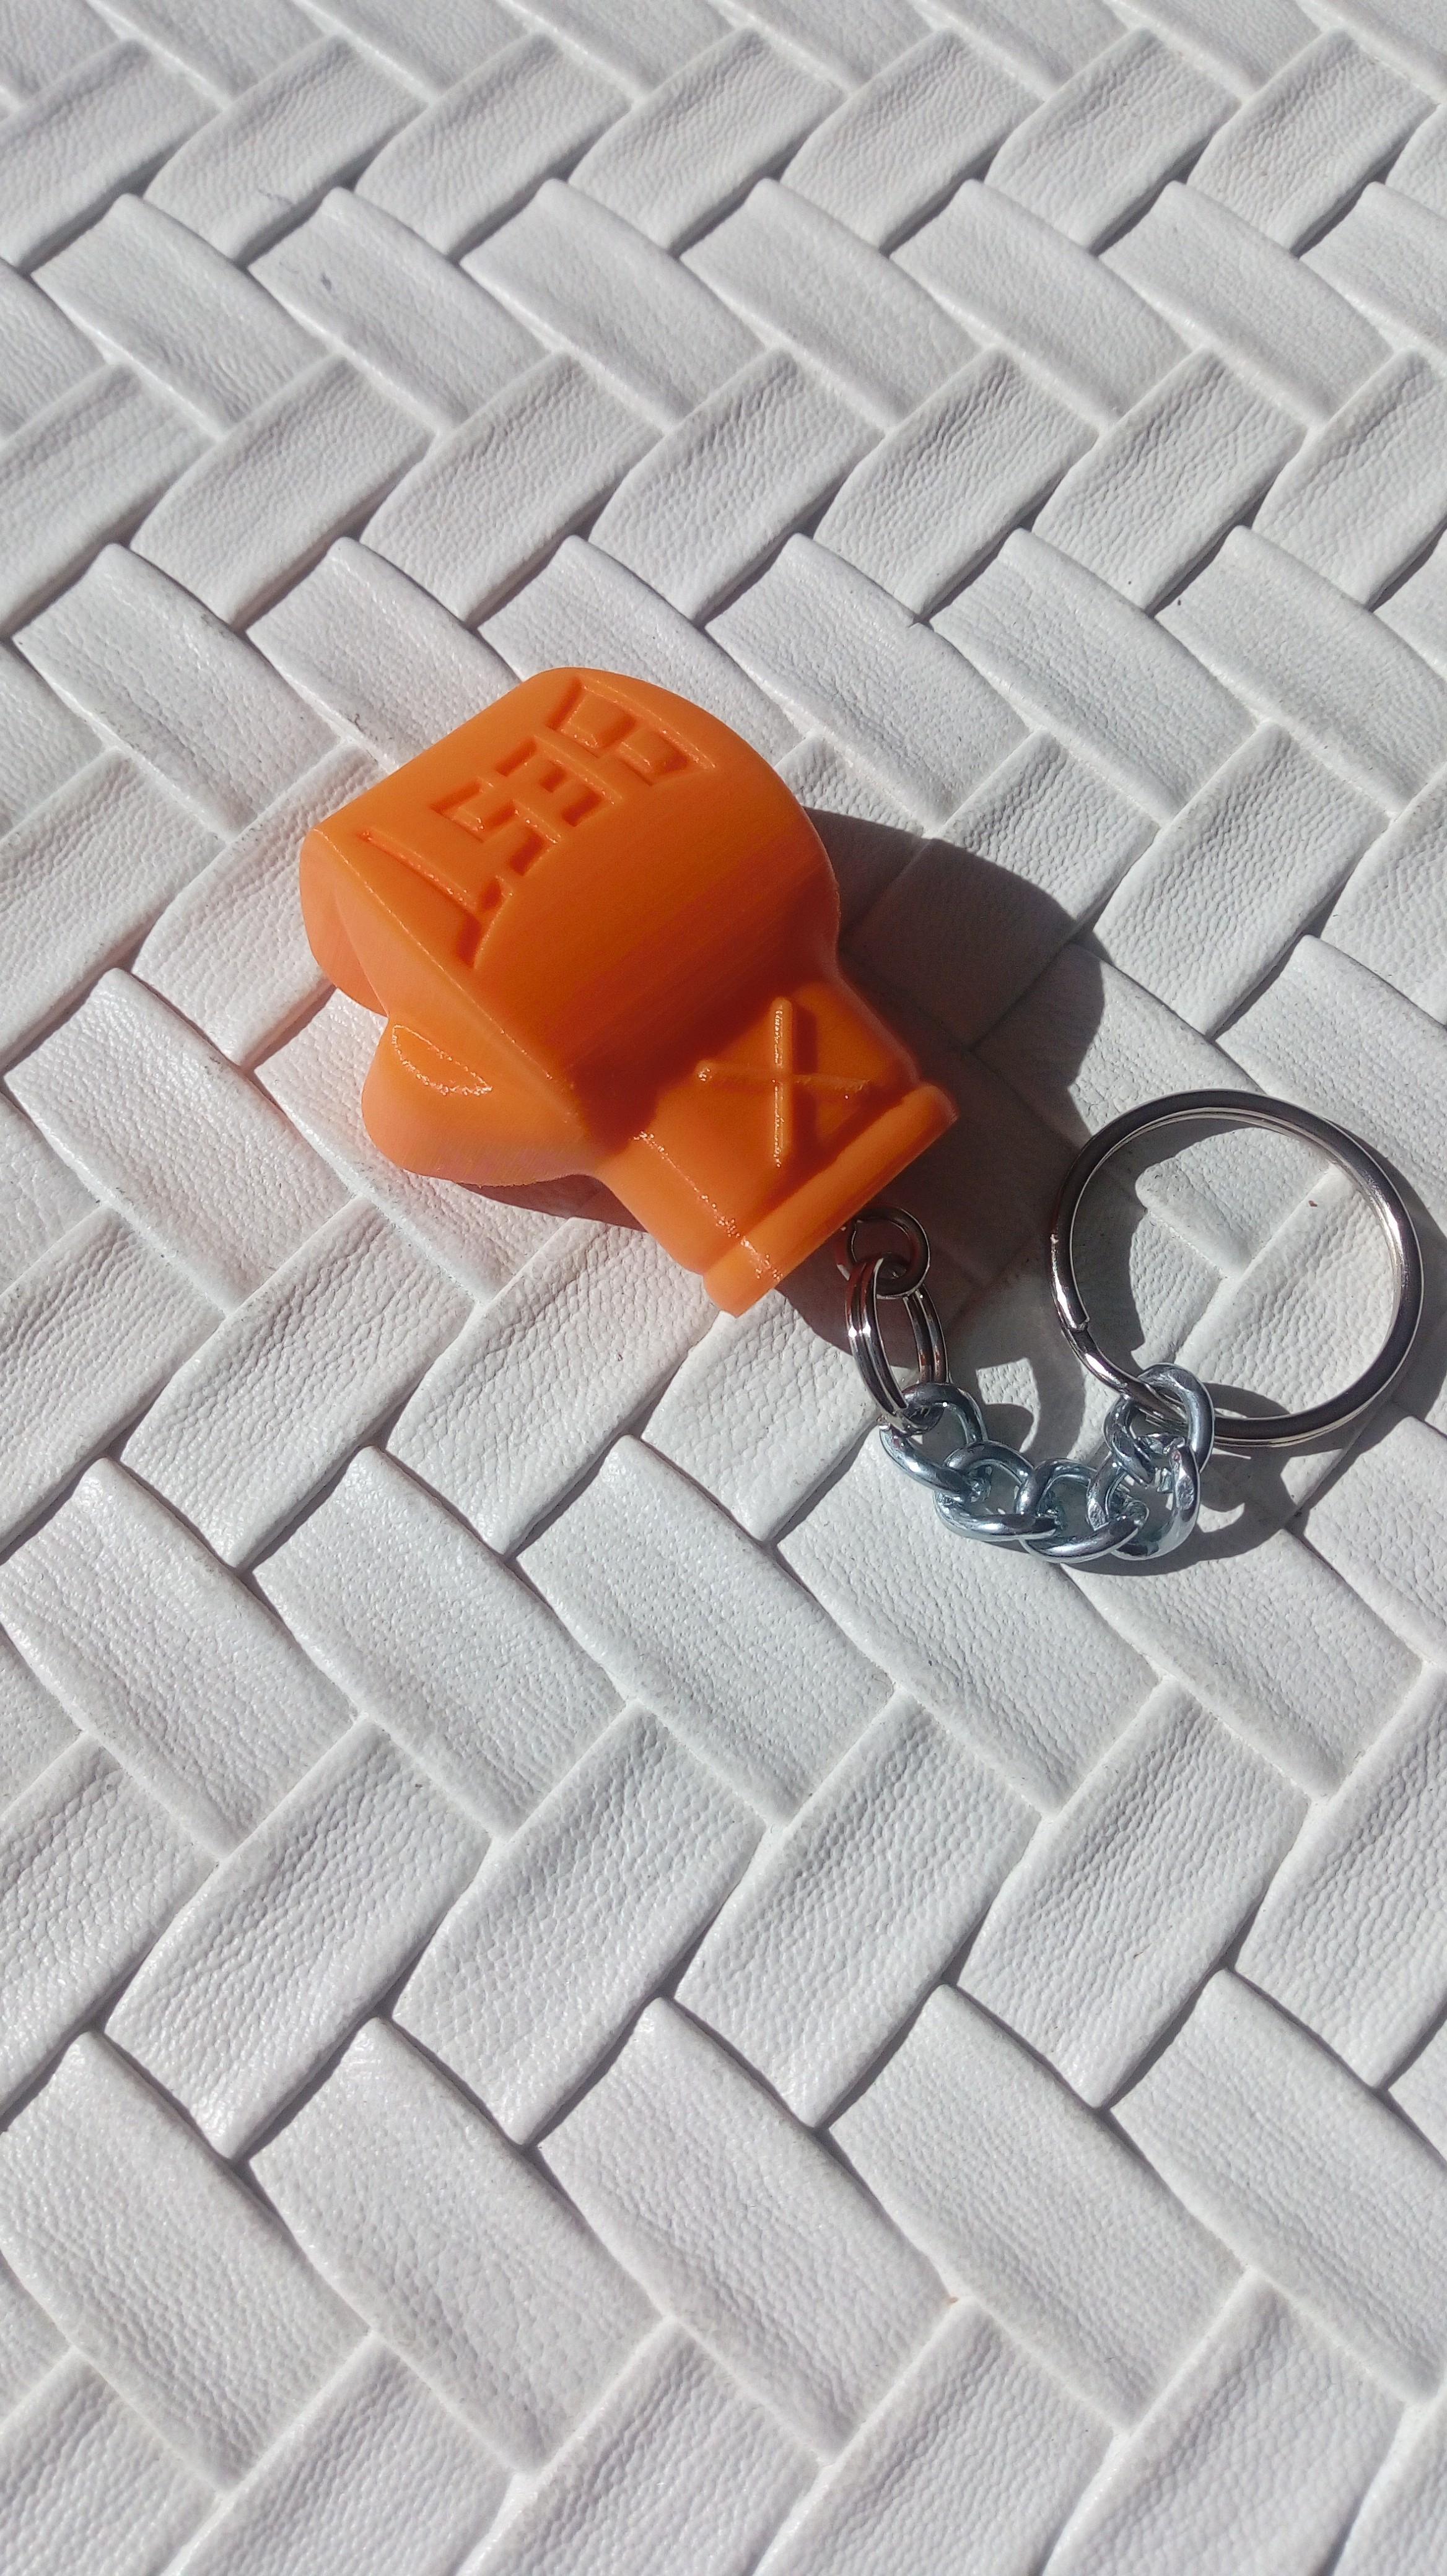 IMG_20190317_143557.jpg Download free STL file BOX GLOVE • 3D printer design, PLP